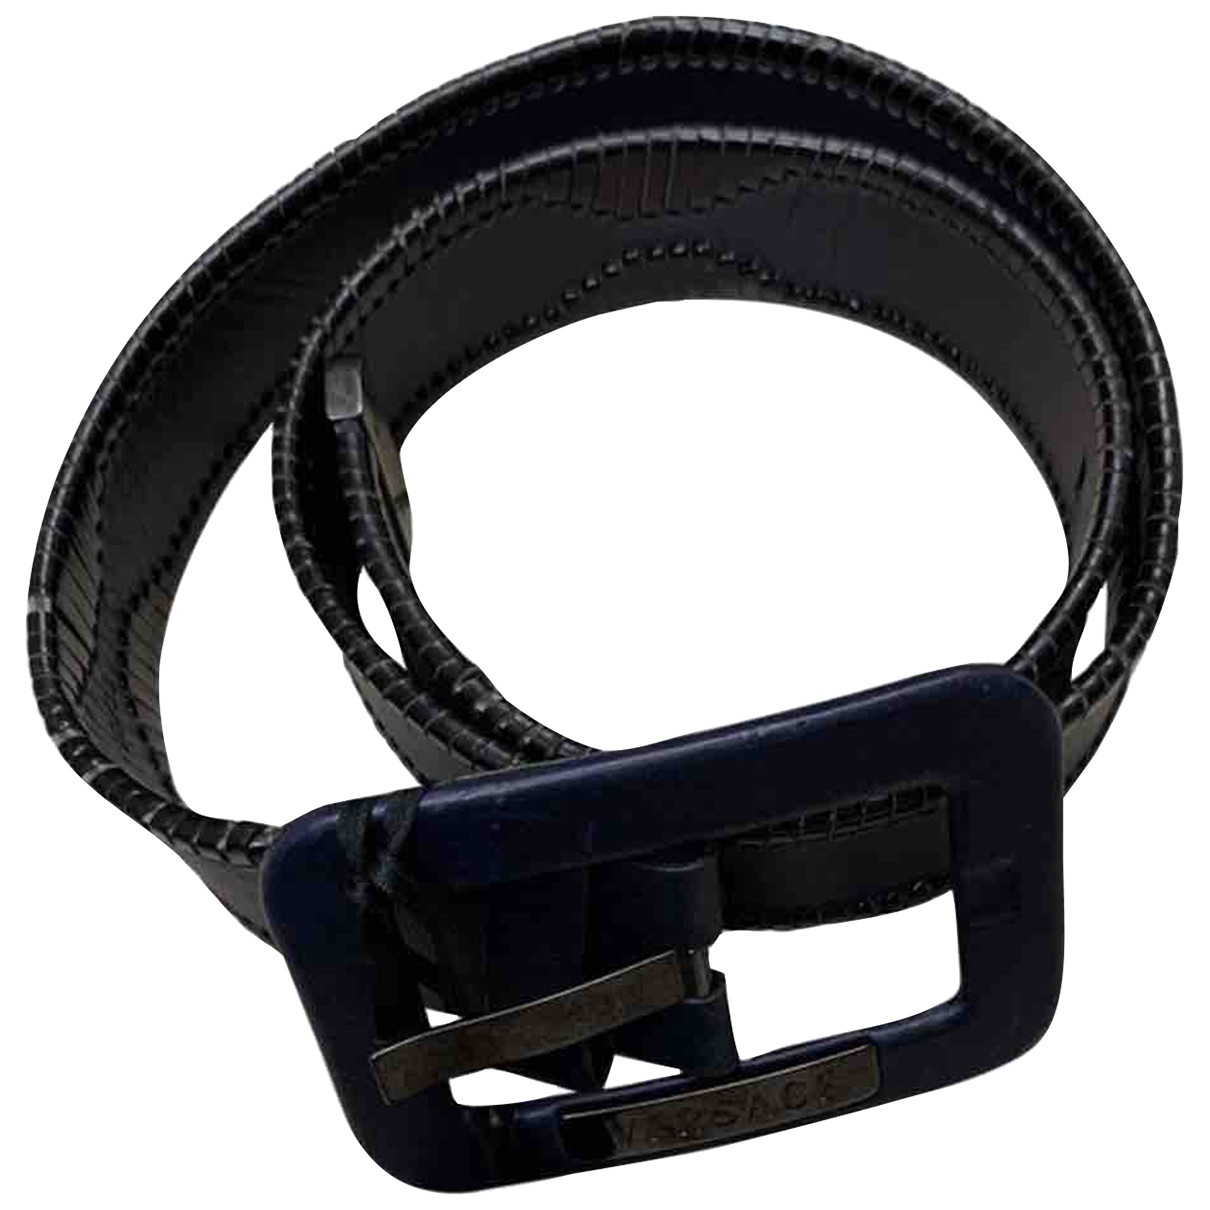 Versace \N Blue Leather belt for Women M International